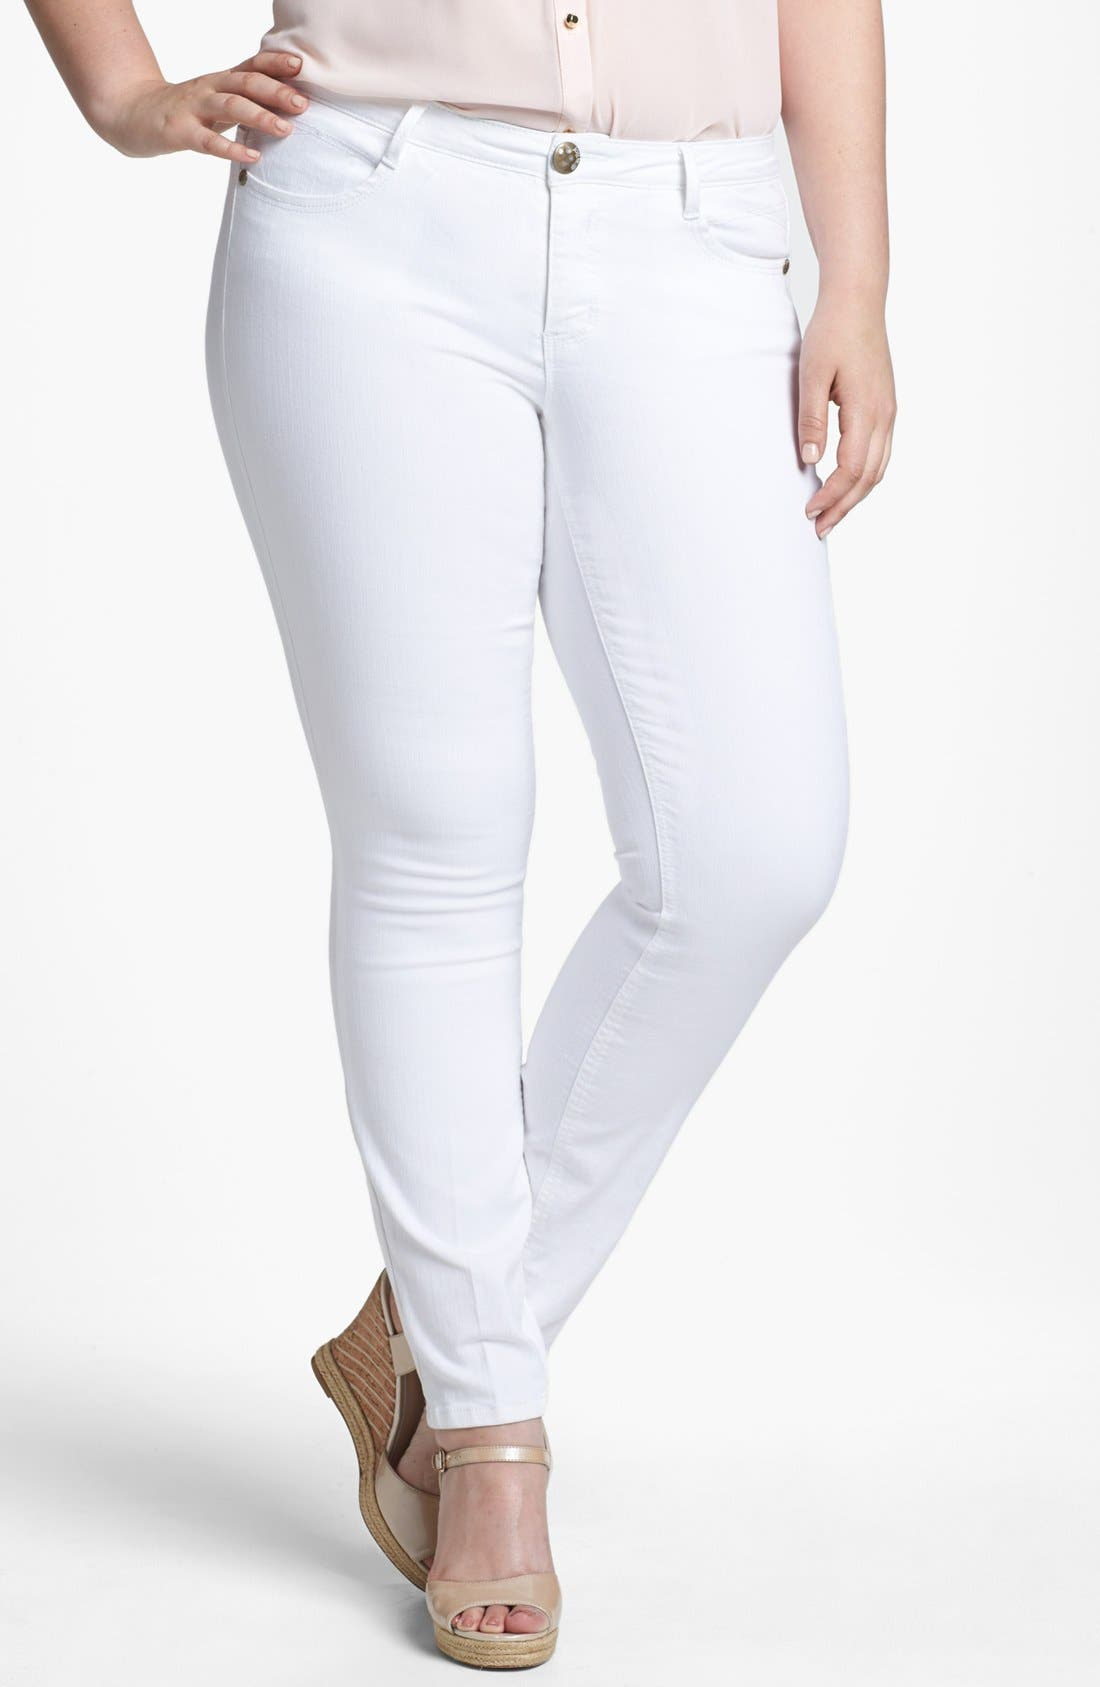 Alternate Image 1 Selected - Jolt Stretch Jeans (Juniors Plus)